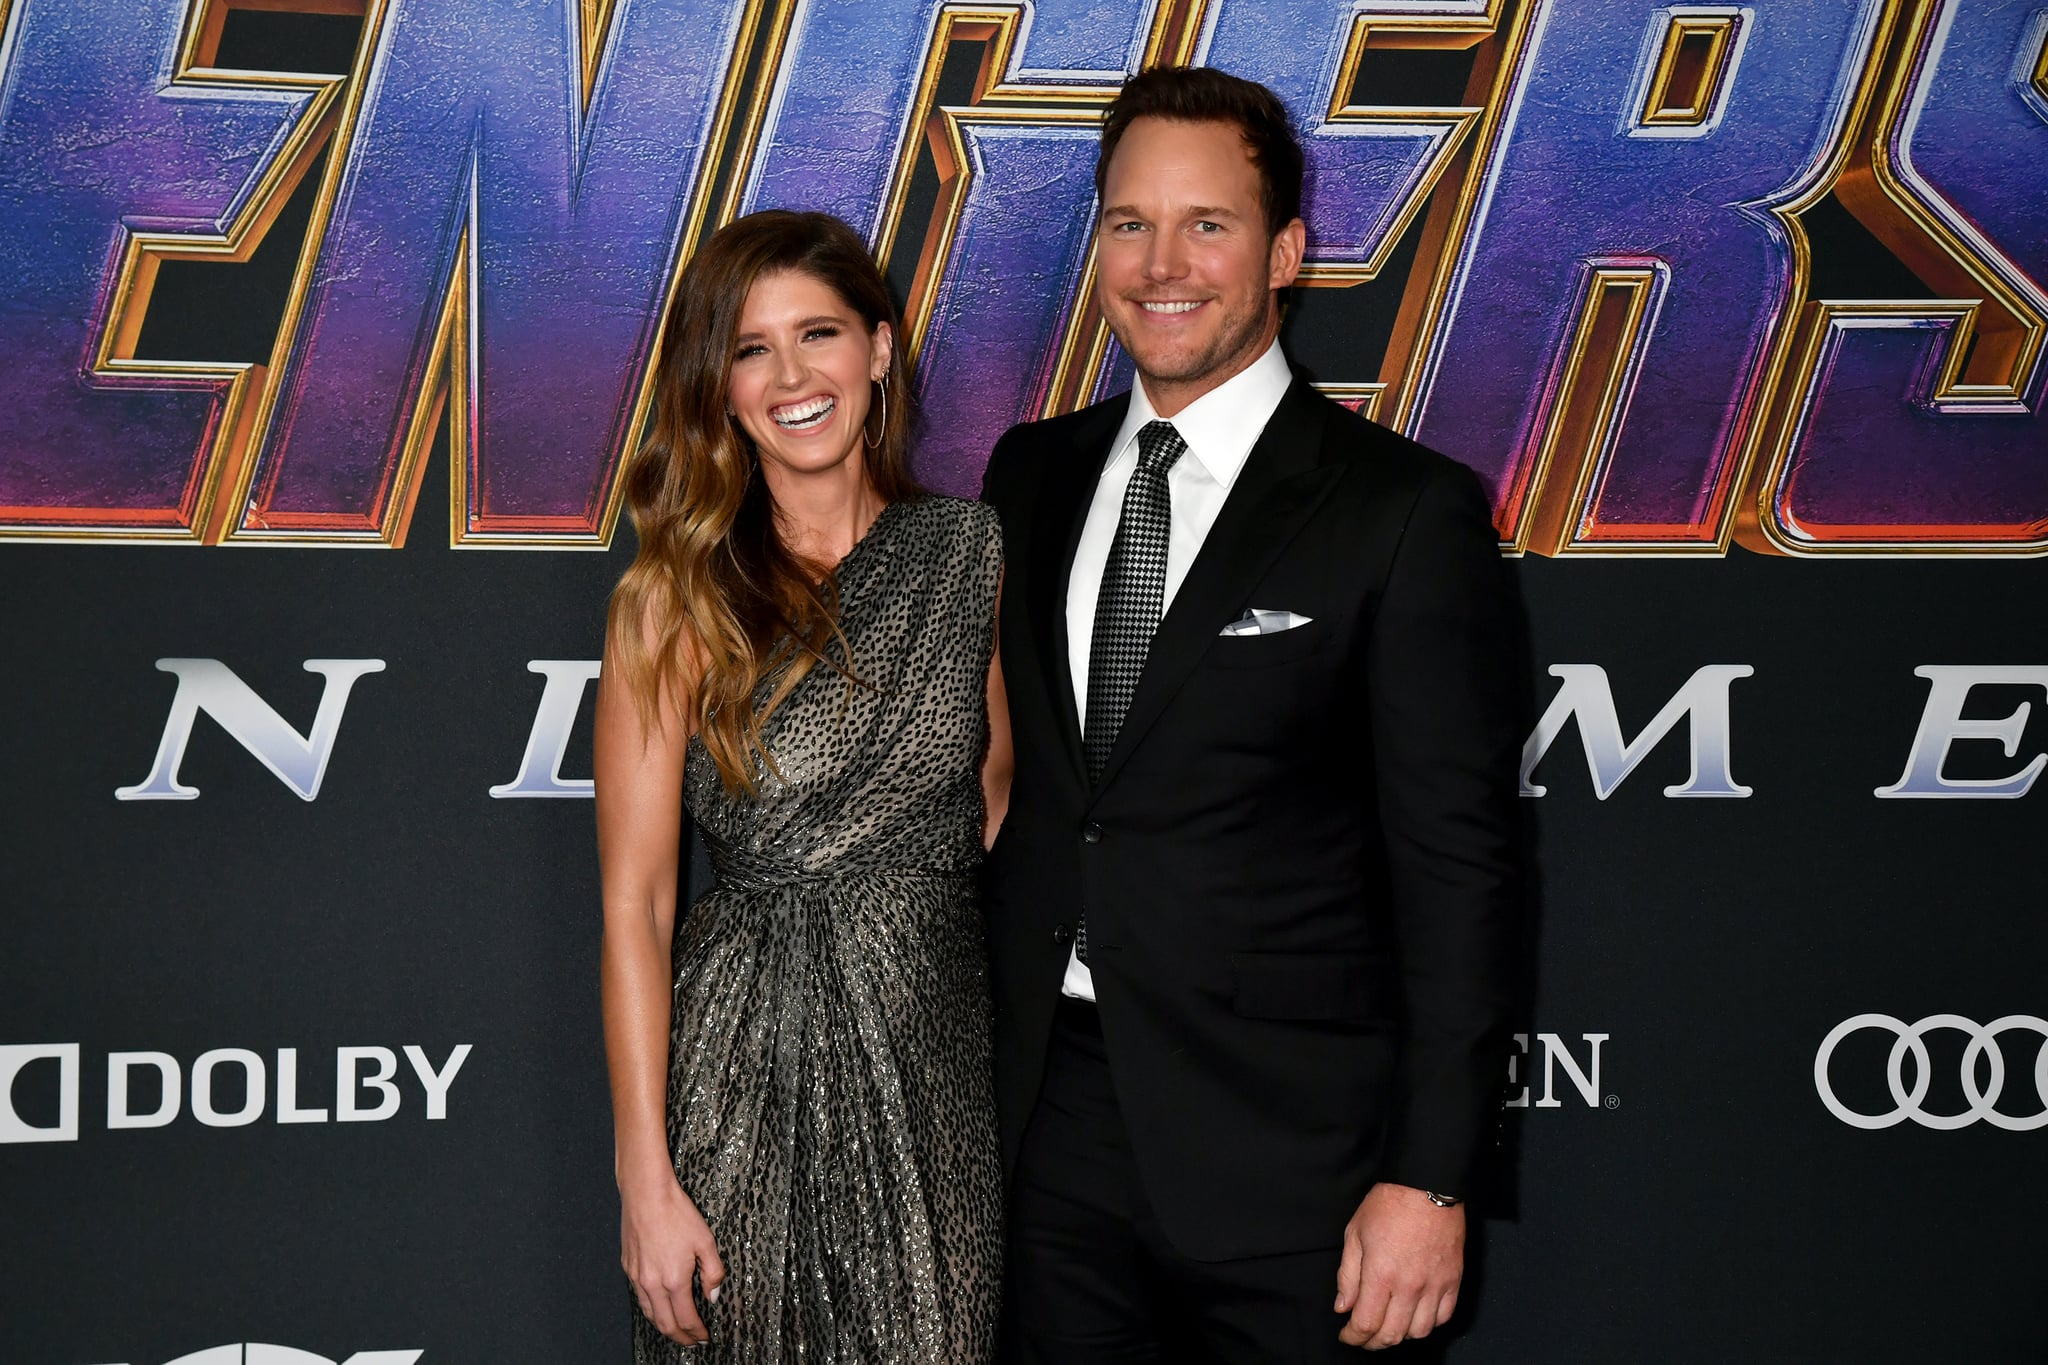 LOS ANGELES, CALIFORNIA - APRIL 22:  Katherine Schwarzenegger and Chris Pratt attends the World Premiere of Walt Disney Studios Motion Pictures